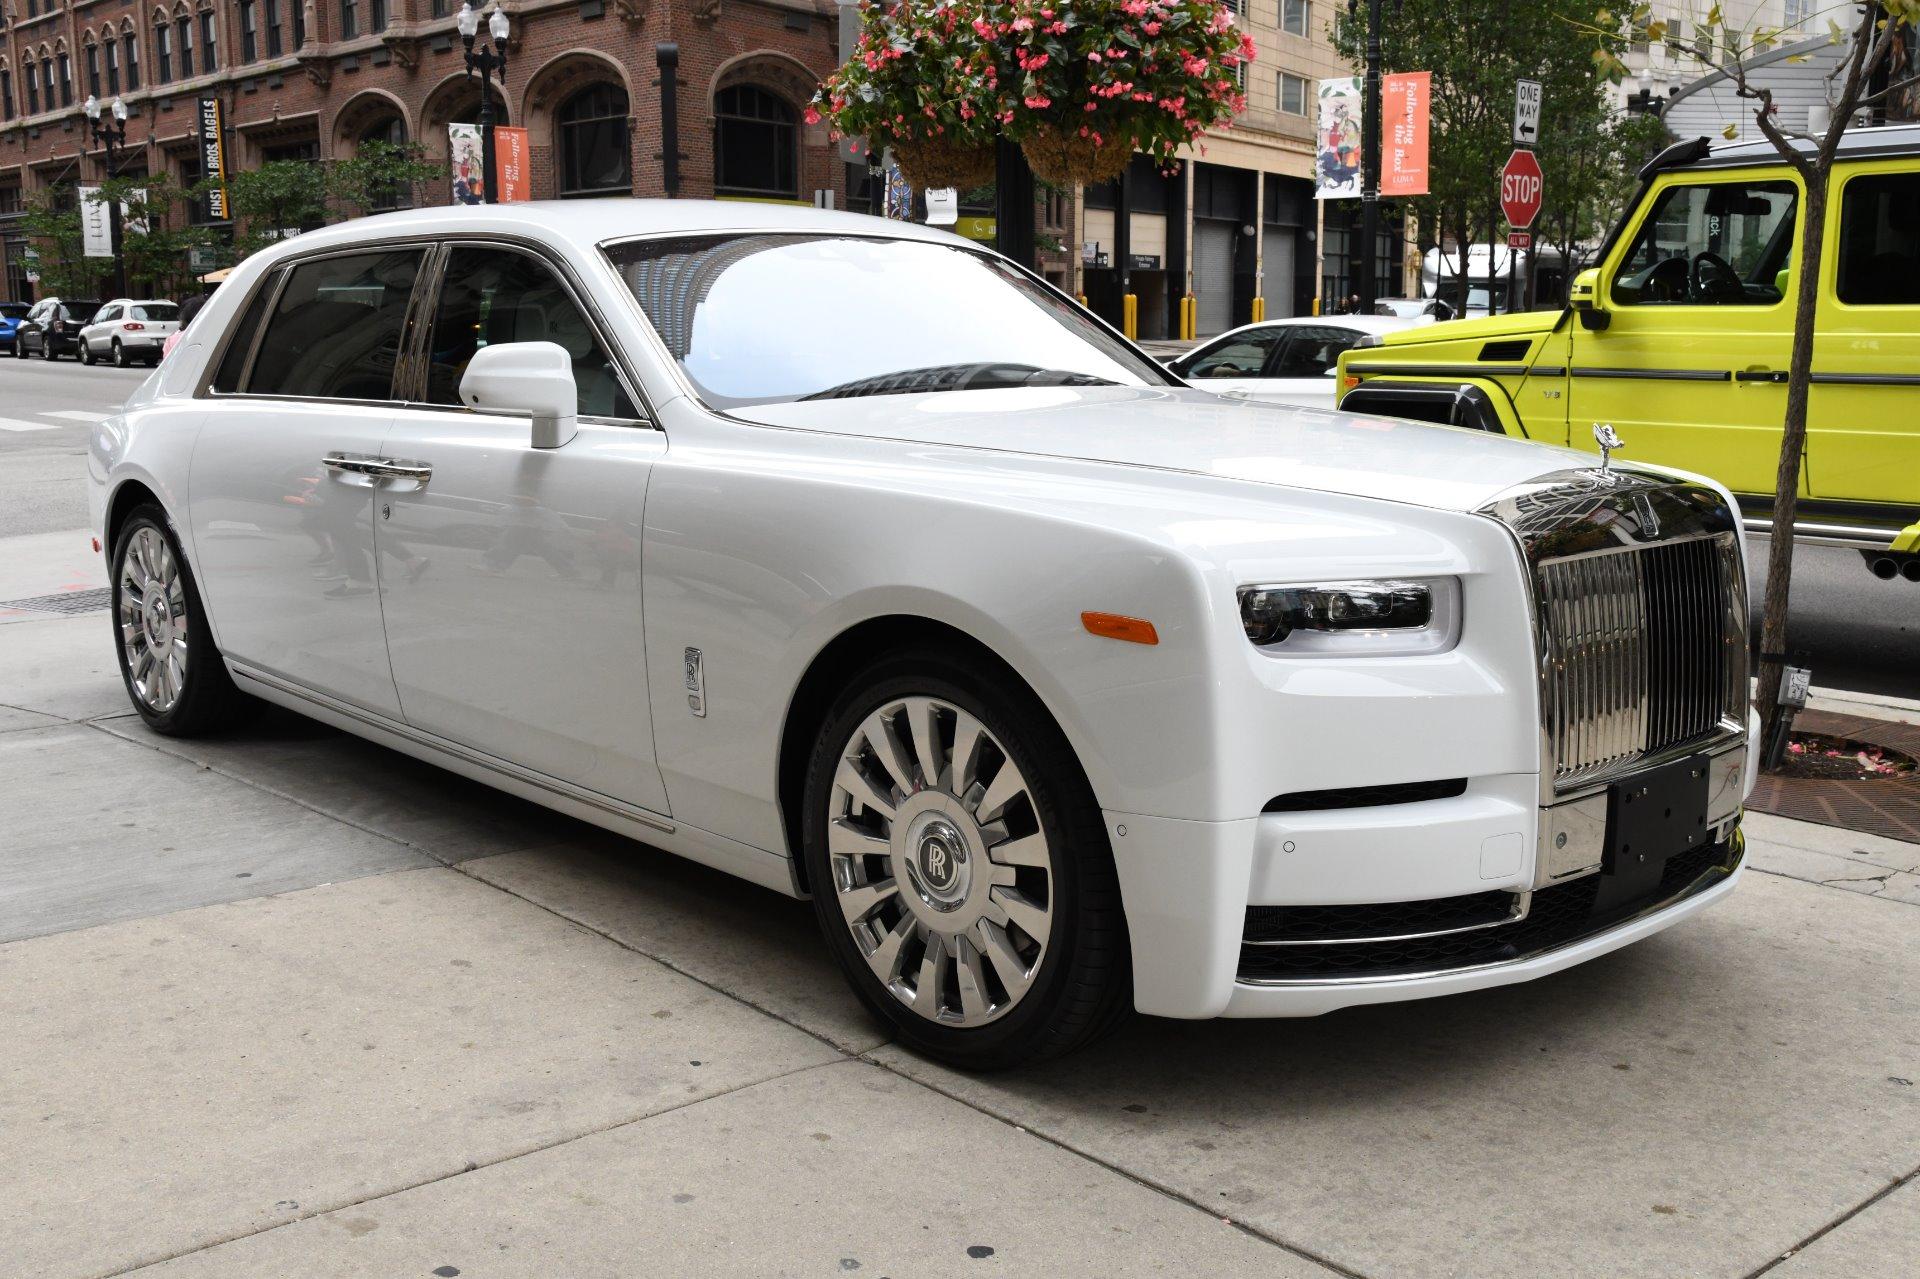 Rolls Royce Phantom Extended Wheelbase Ewb Luxury Pulse Cars United States For Sale On Luxurypulse